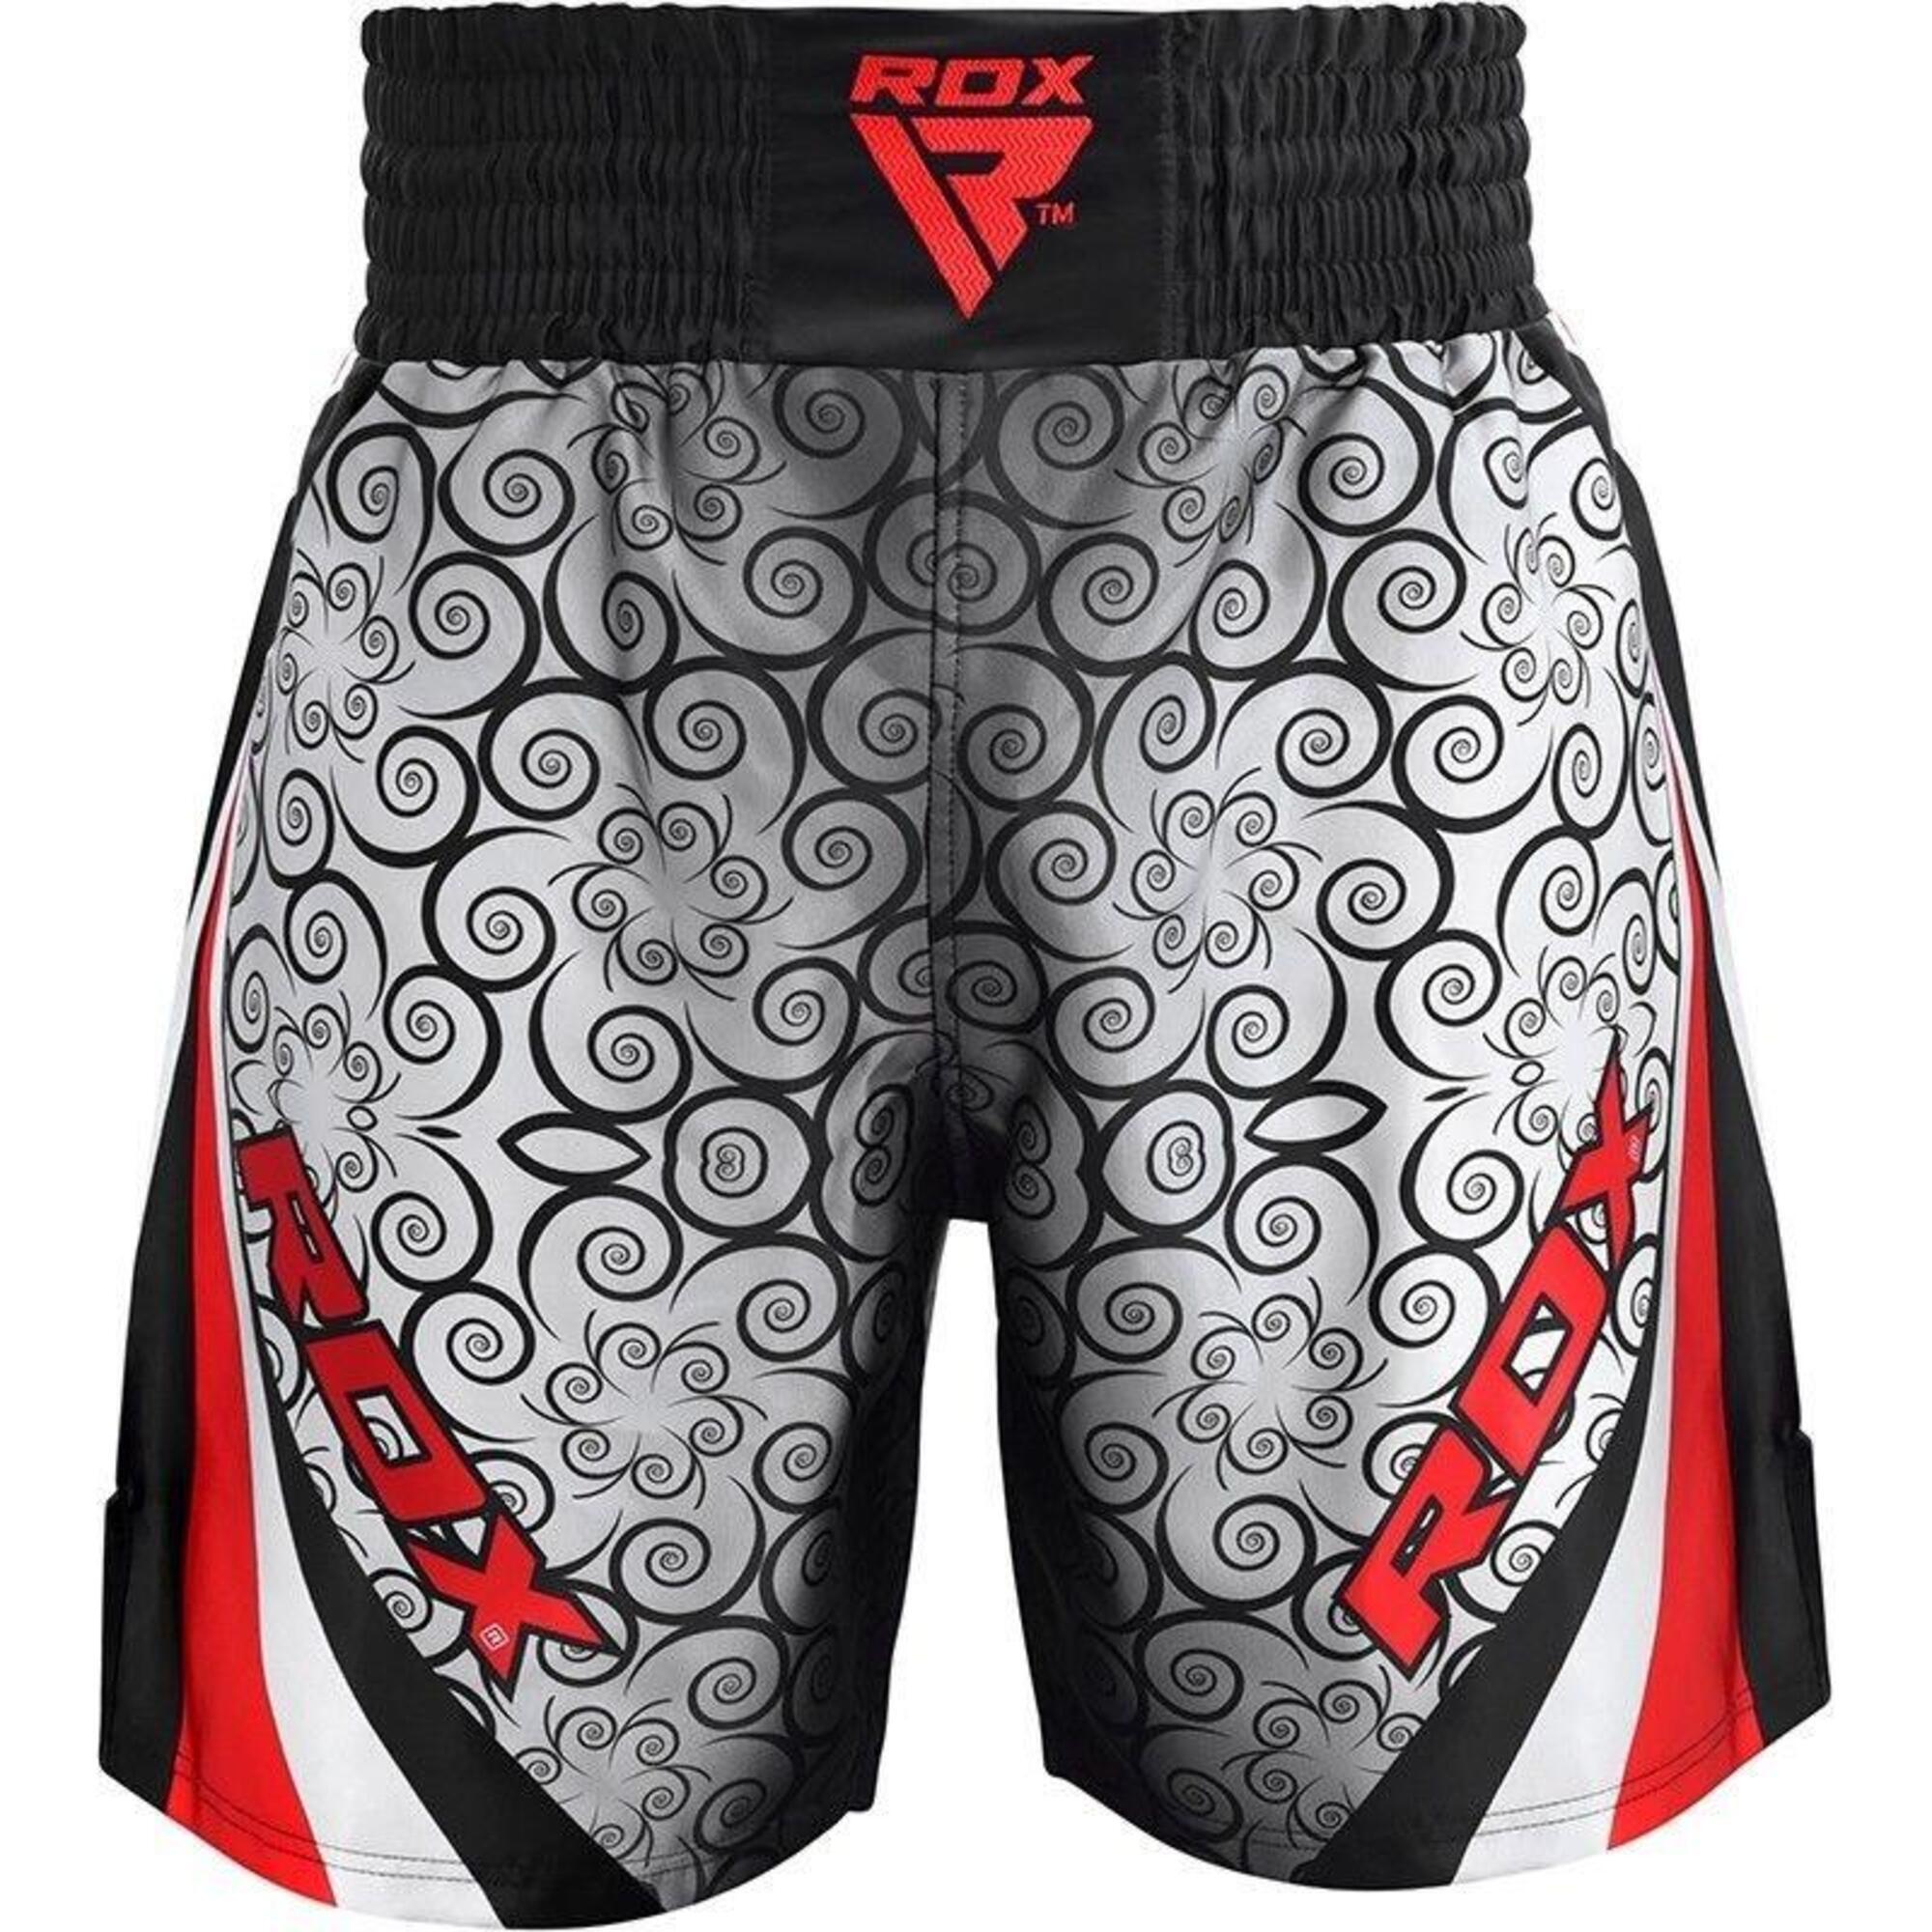 BSS Boxing Training Shorts Satin R1 - Rouge - XL